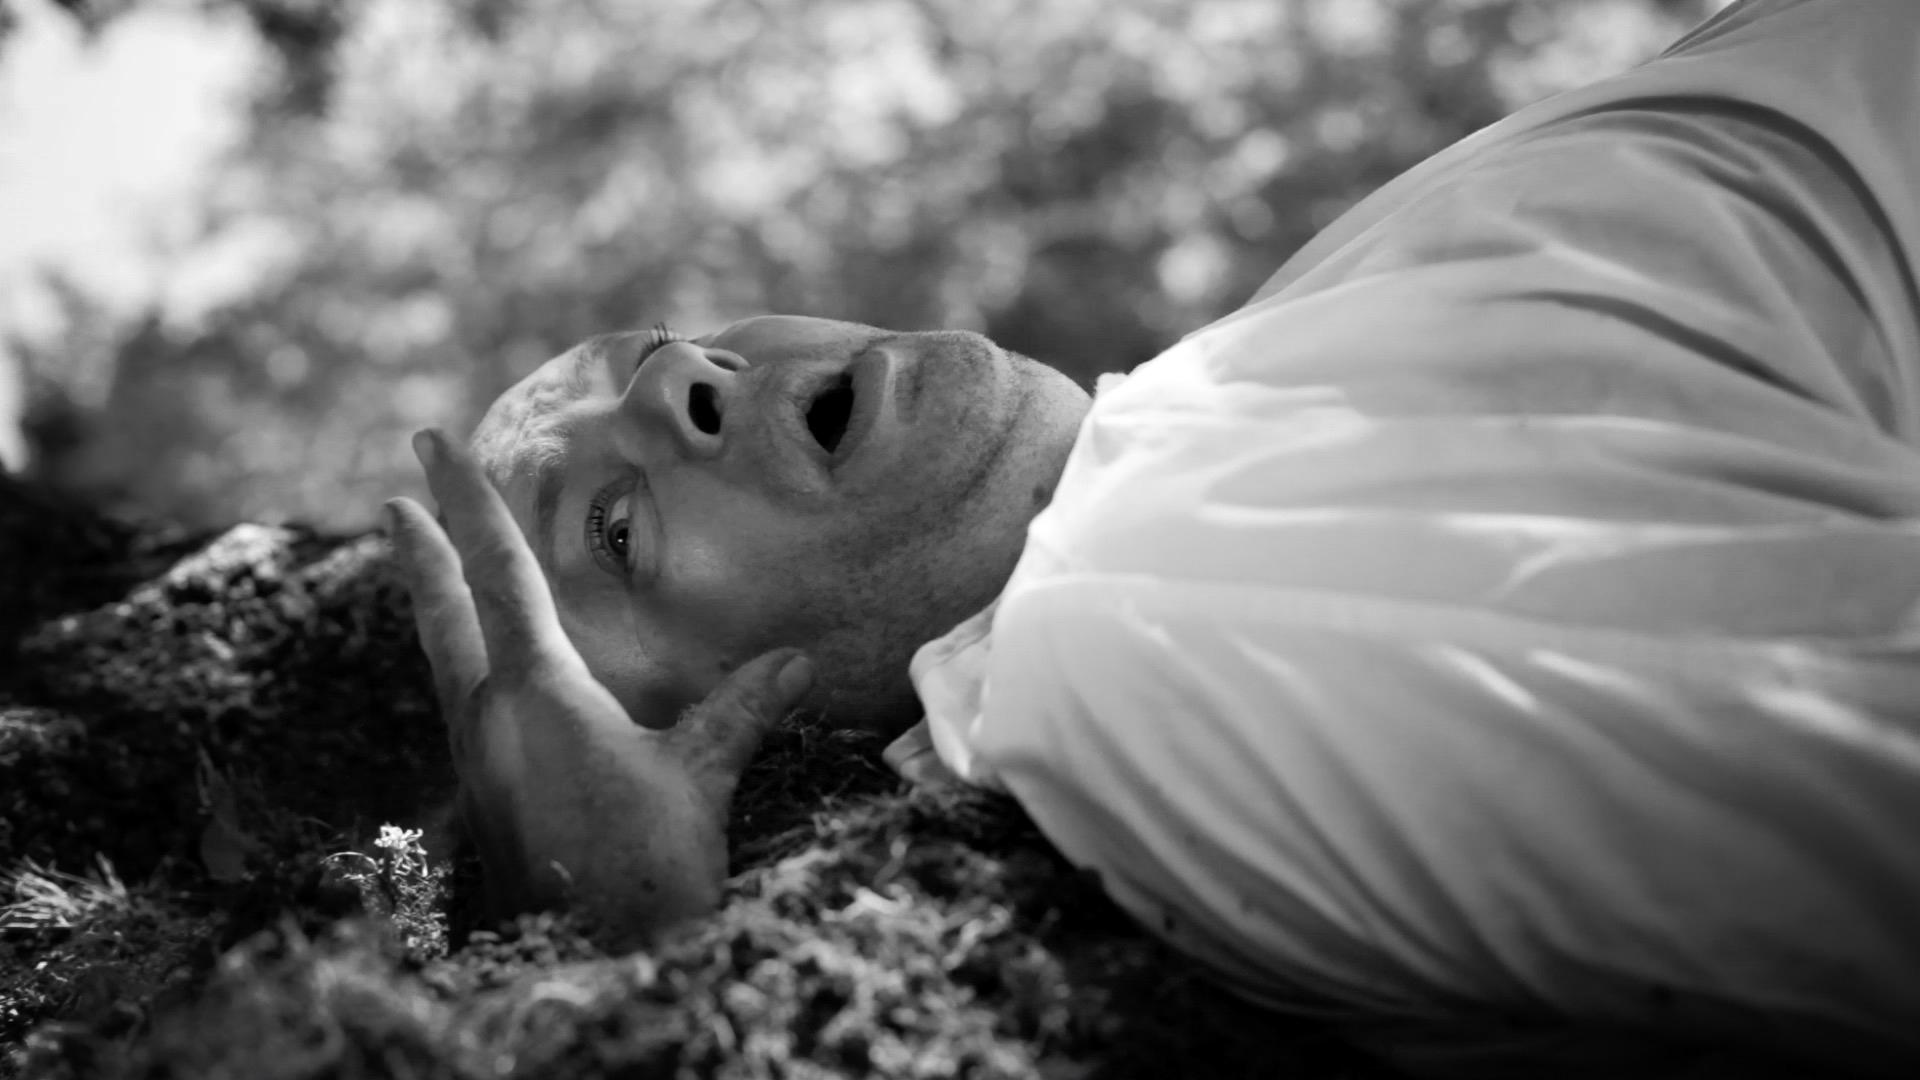 Clip de Musique Riberaigua Viviane – Borderline – Artiste Andrew – Main de zombie sort de terre